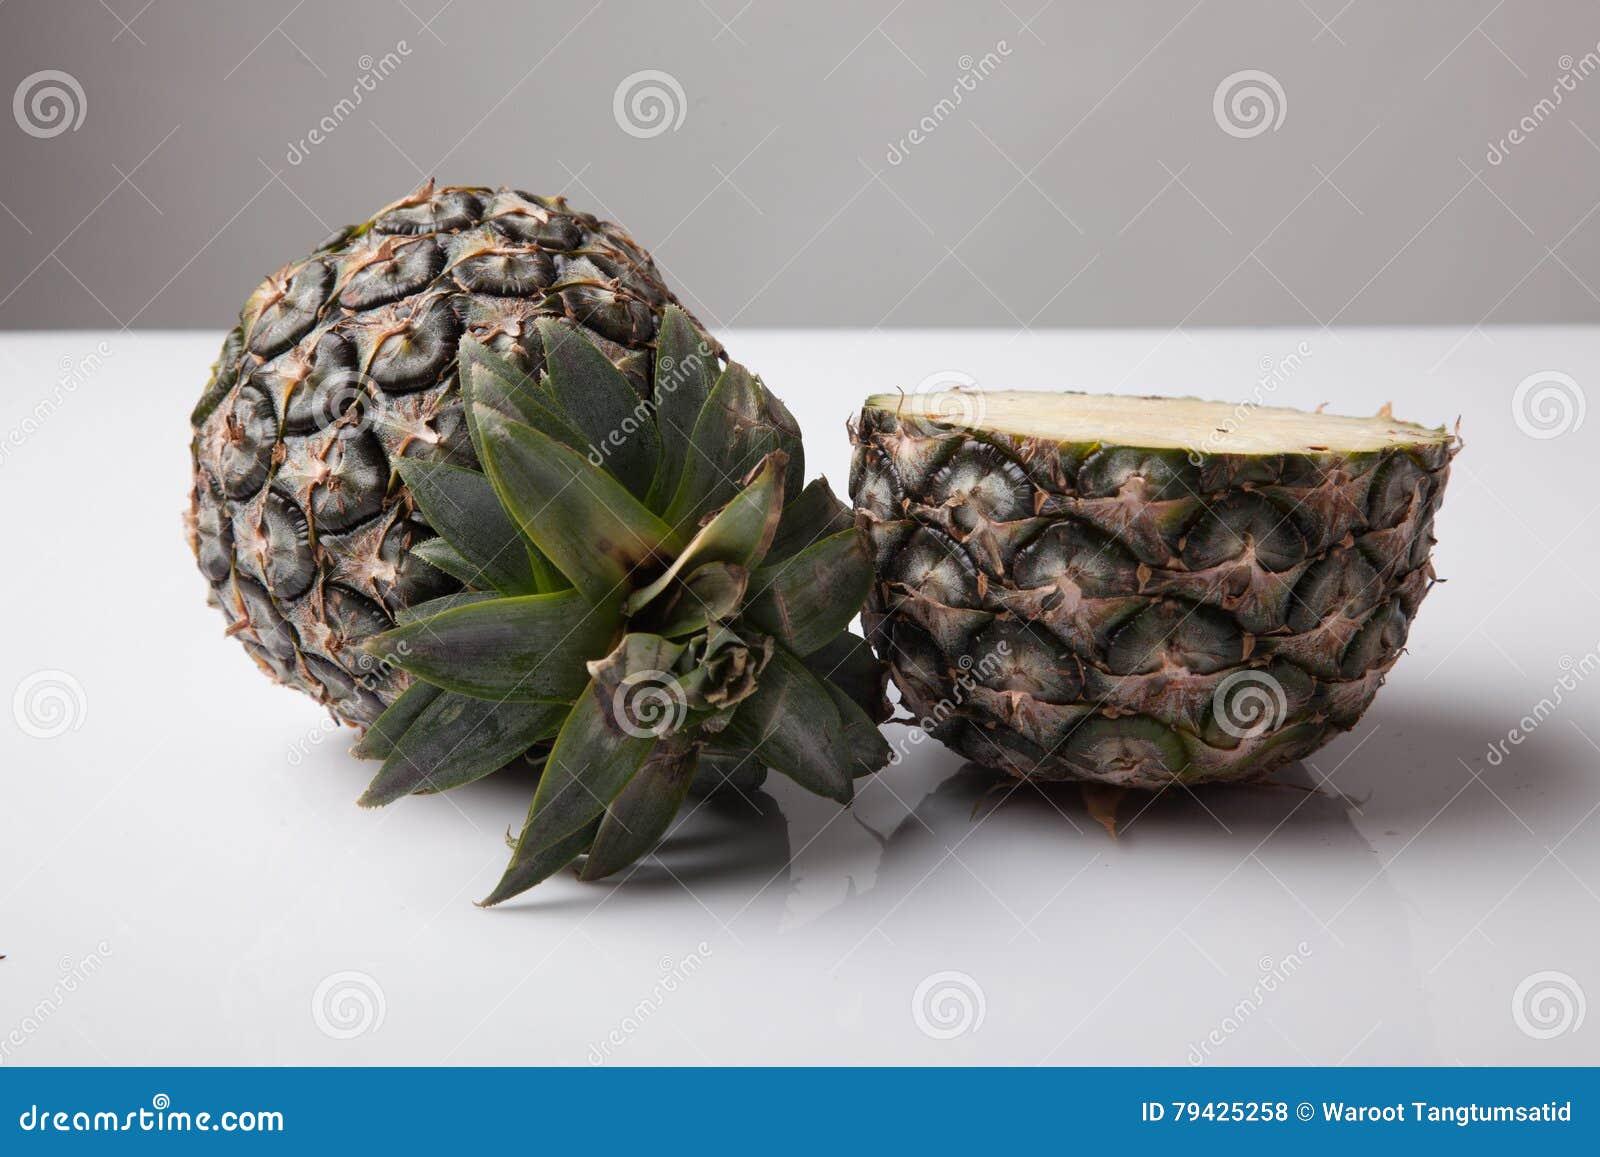 Awe Inspiring Half Cut Fresh Pineapple Stock Photo Image 79425258 Hairstyle Inspiration Daily Dogsangcom